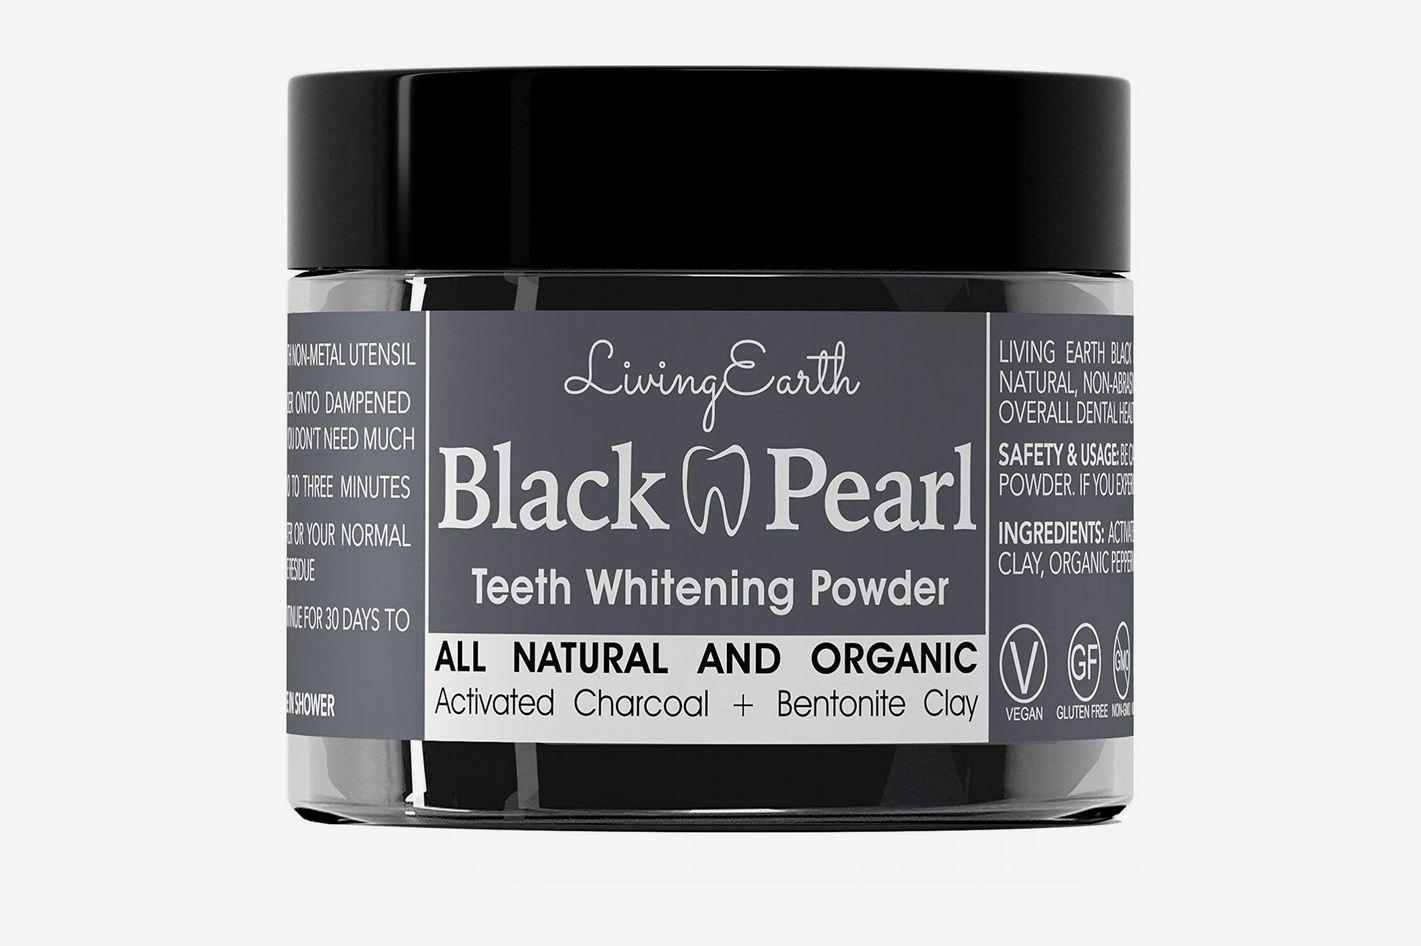 Living Earth Black Pearl Teeth-Whitening Powder